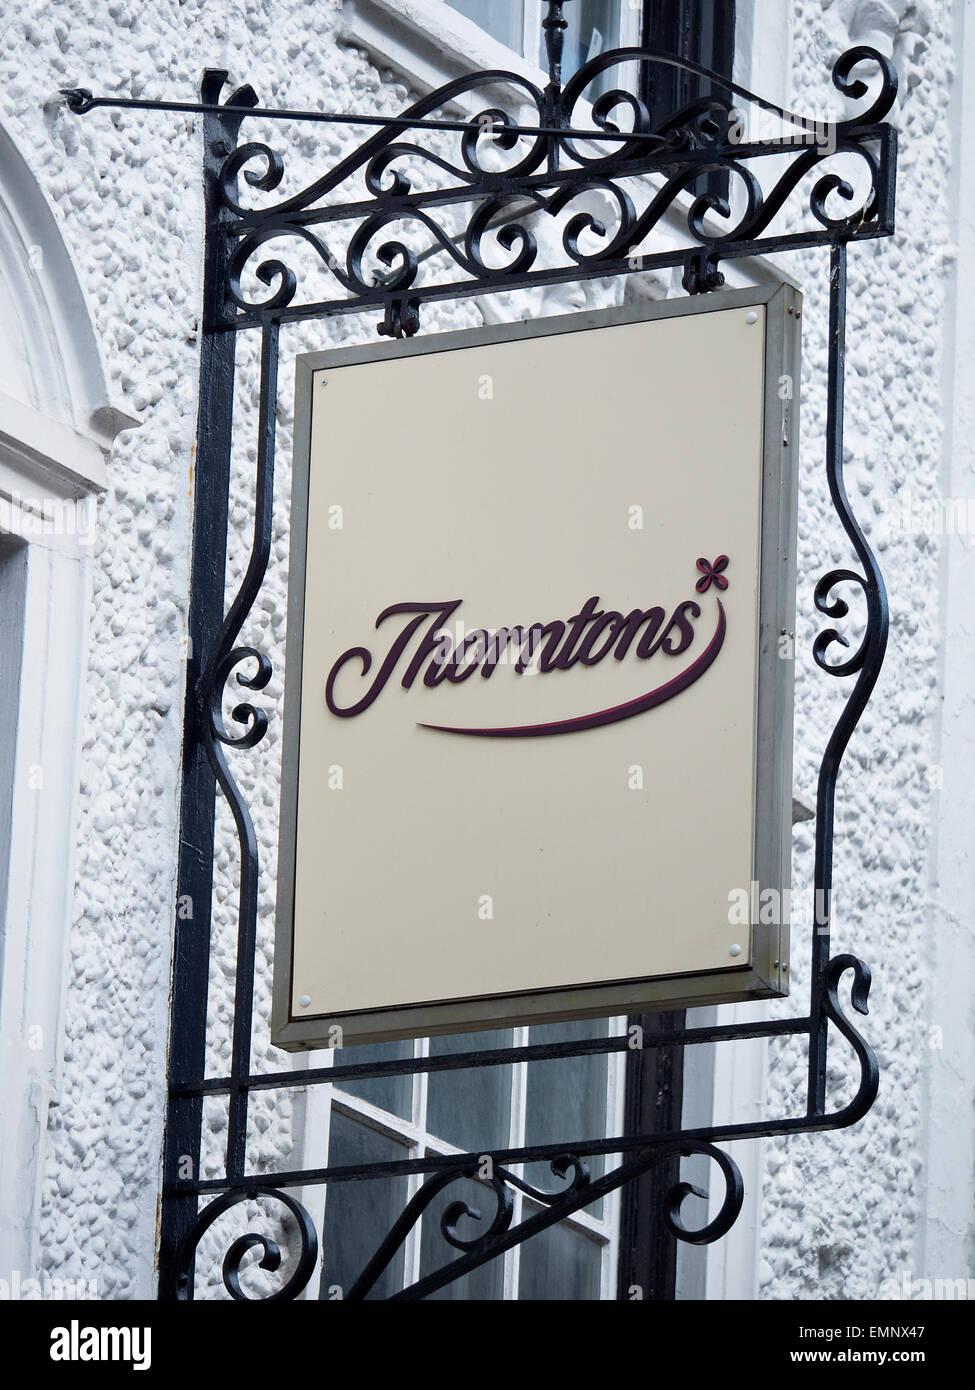 Thorntons shop sign UK - Stock Image